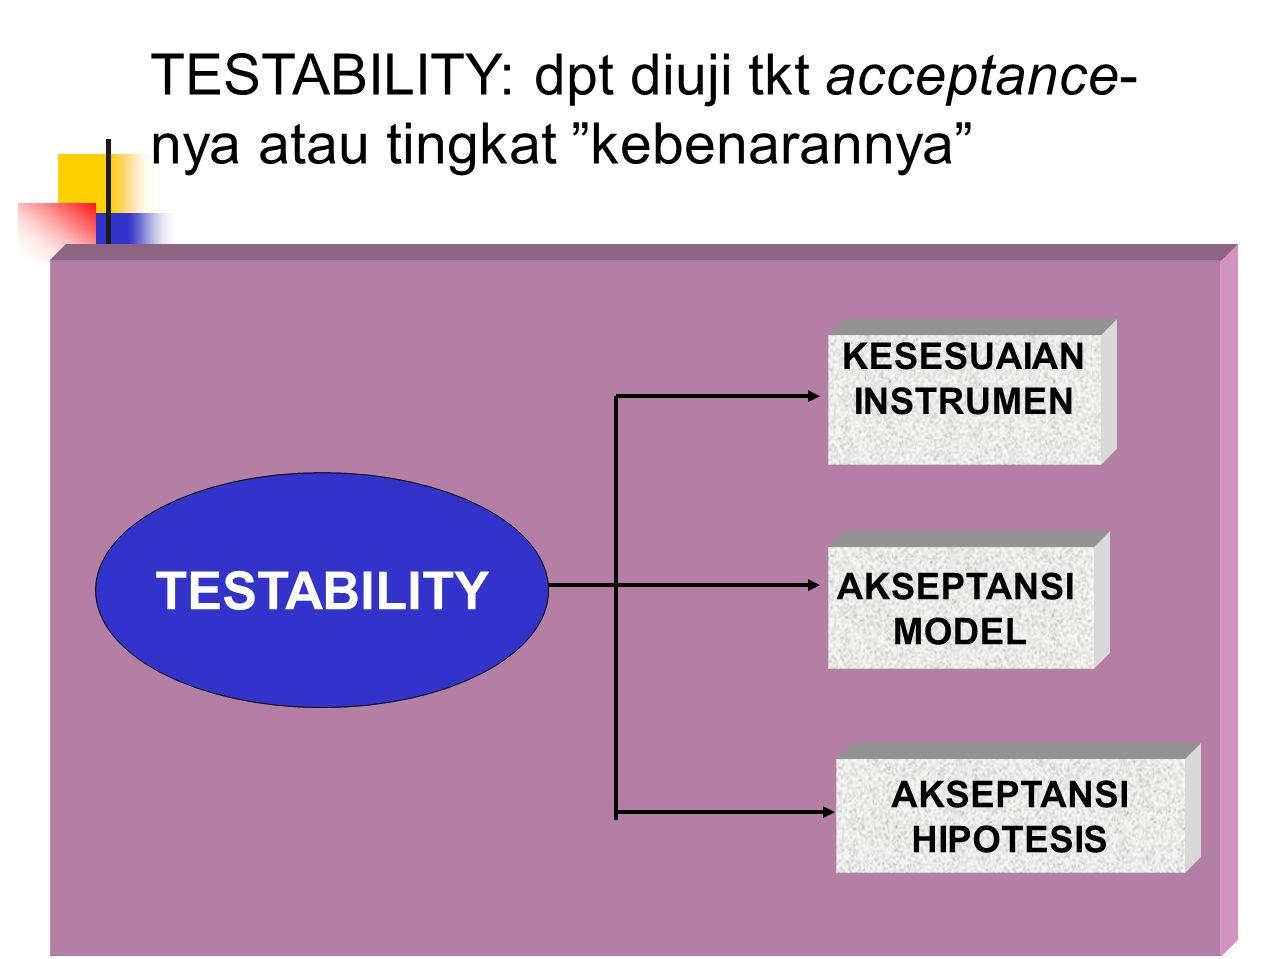 TESTABILITY: dpt diuji tkt acceptance-nya atau tingkat kebenarannya